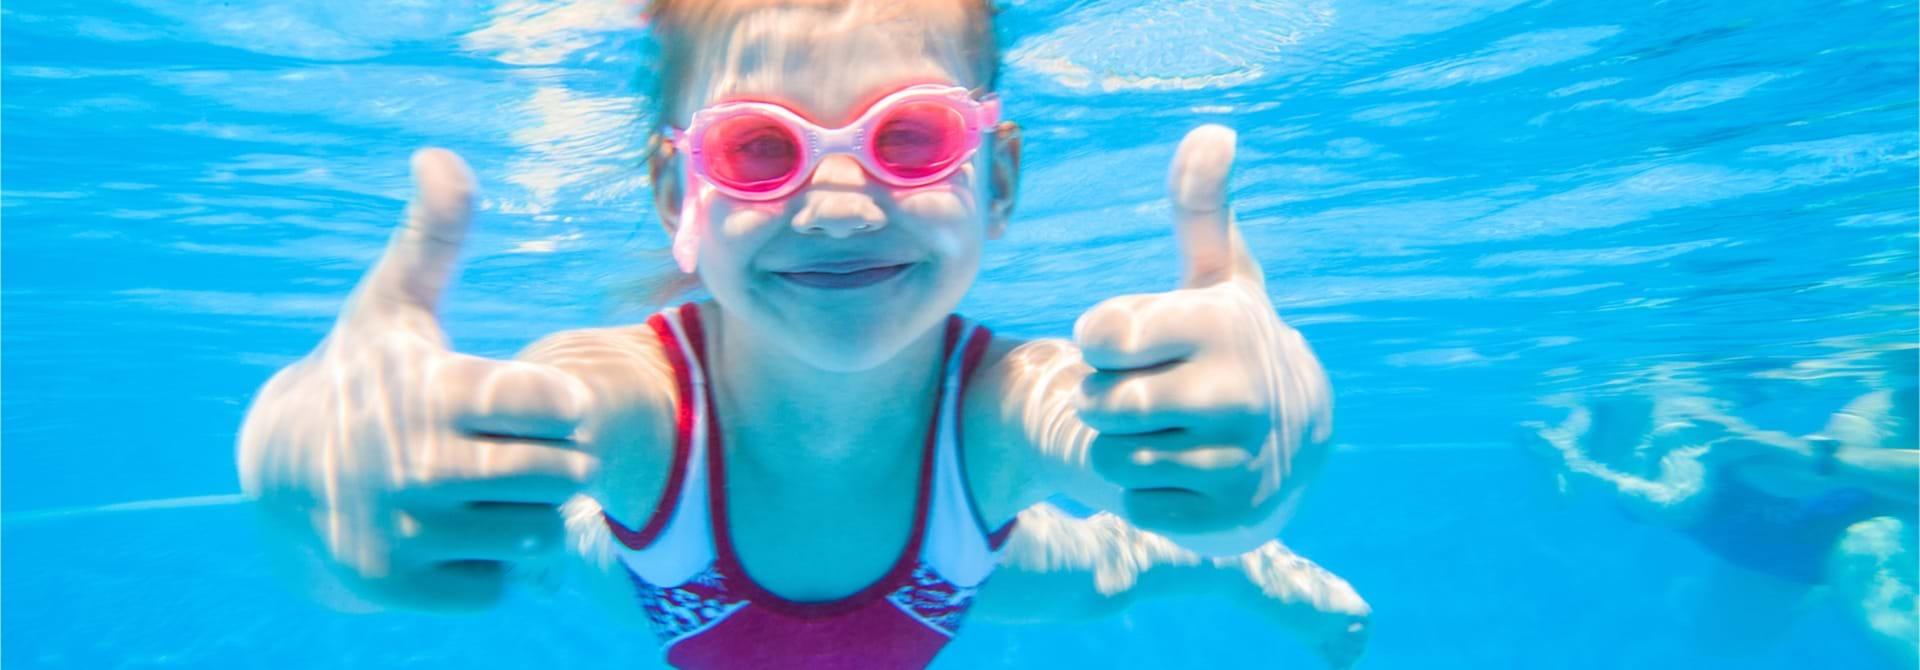 Barn Svømmer Stock Web